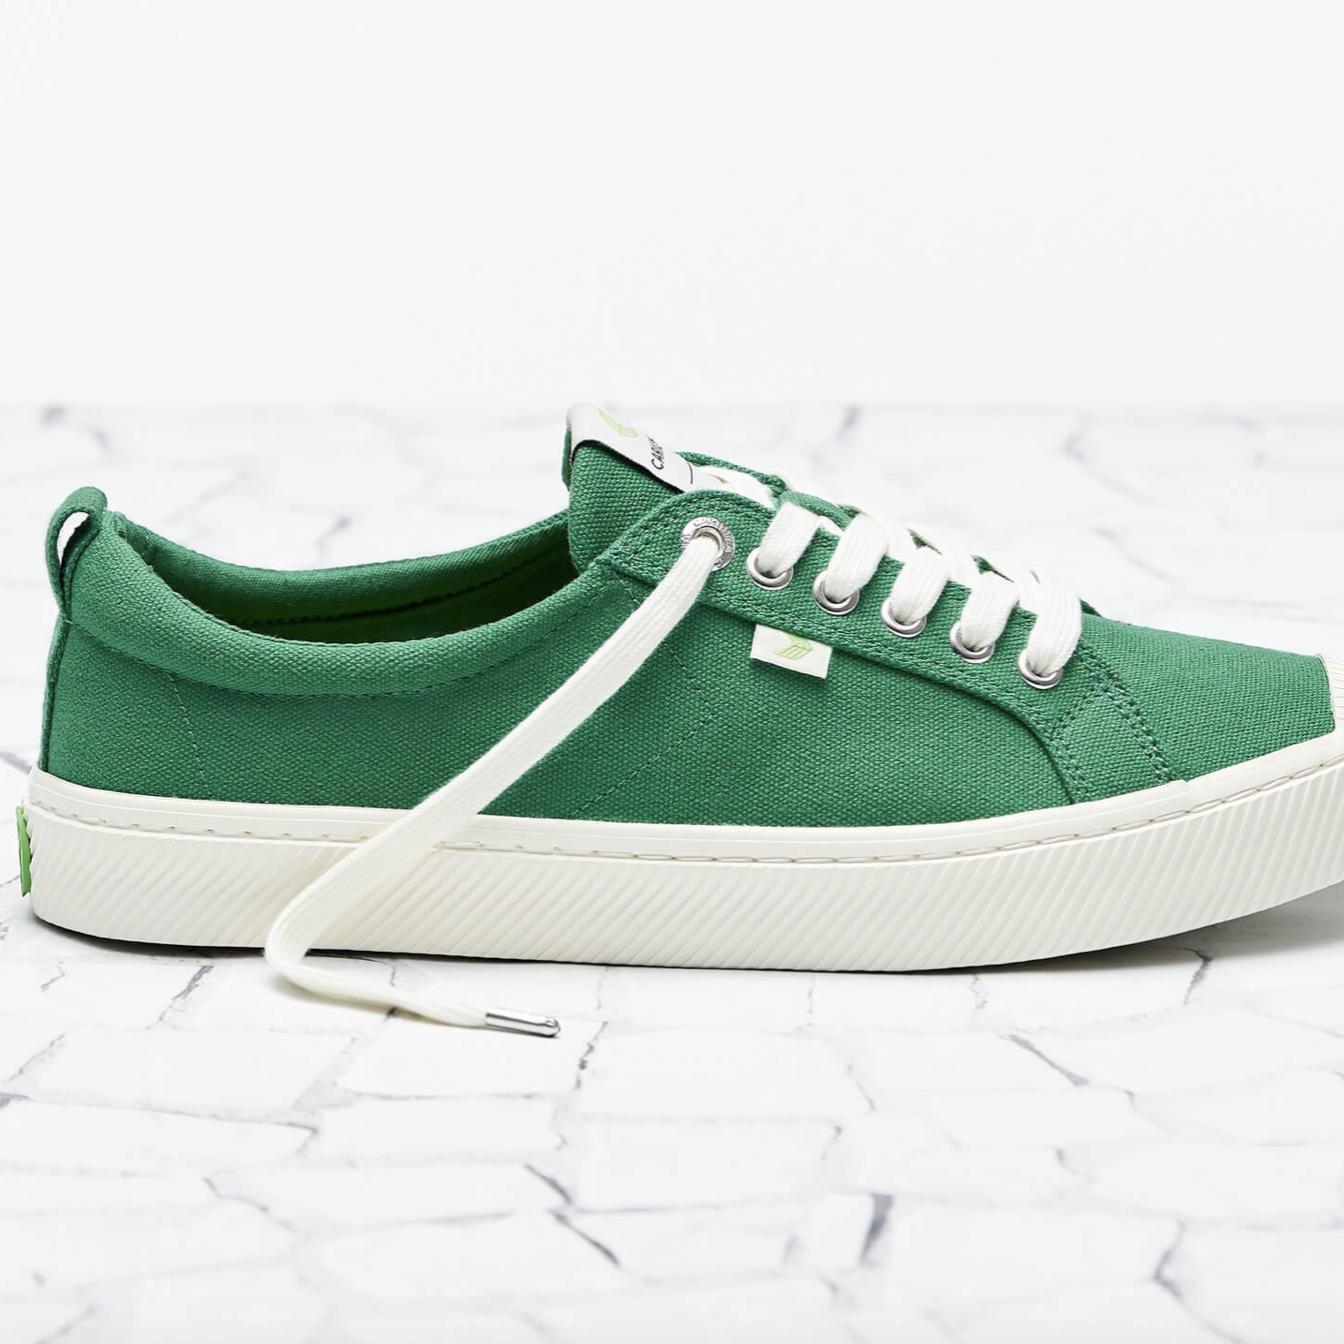 summer uniform green sneakers